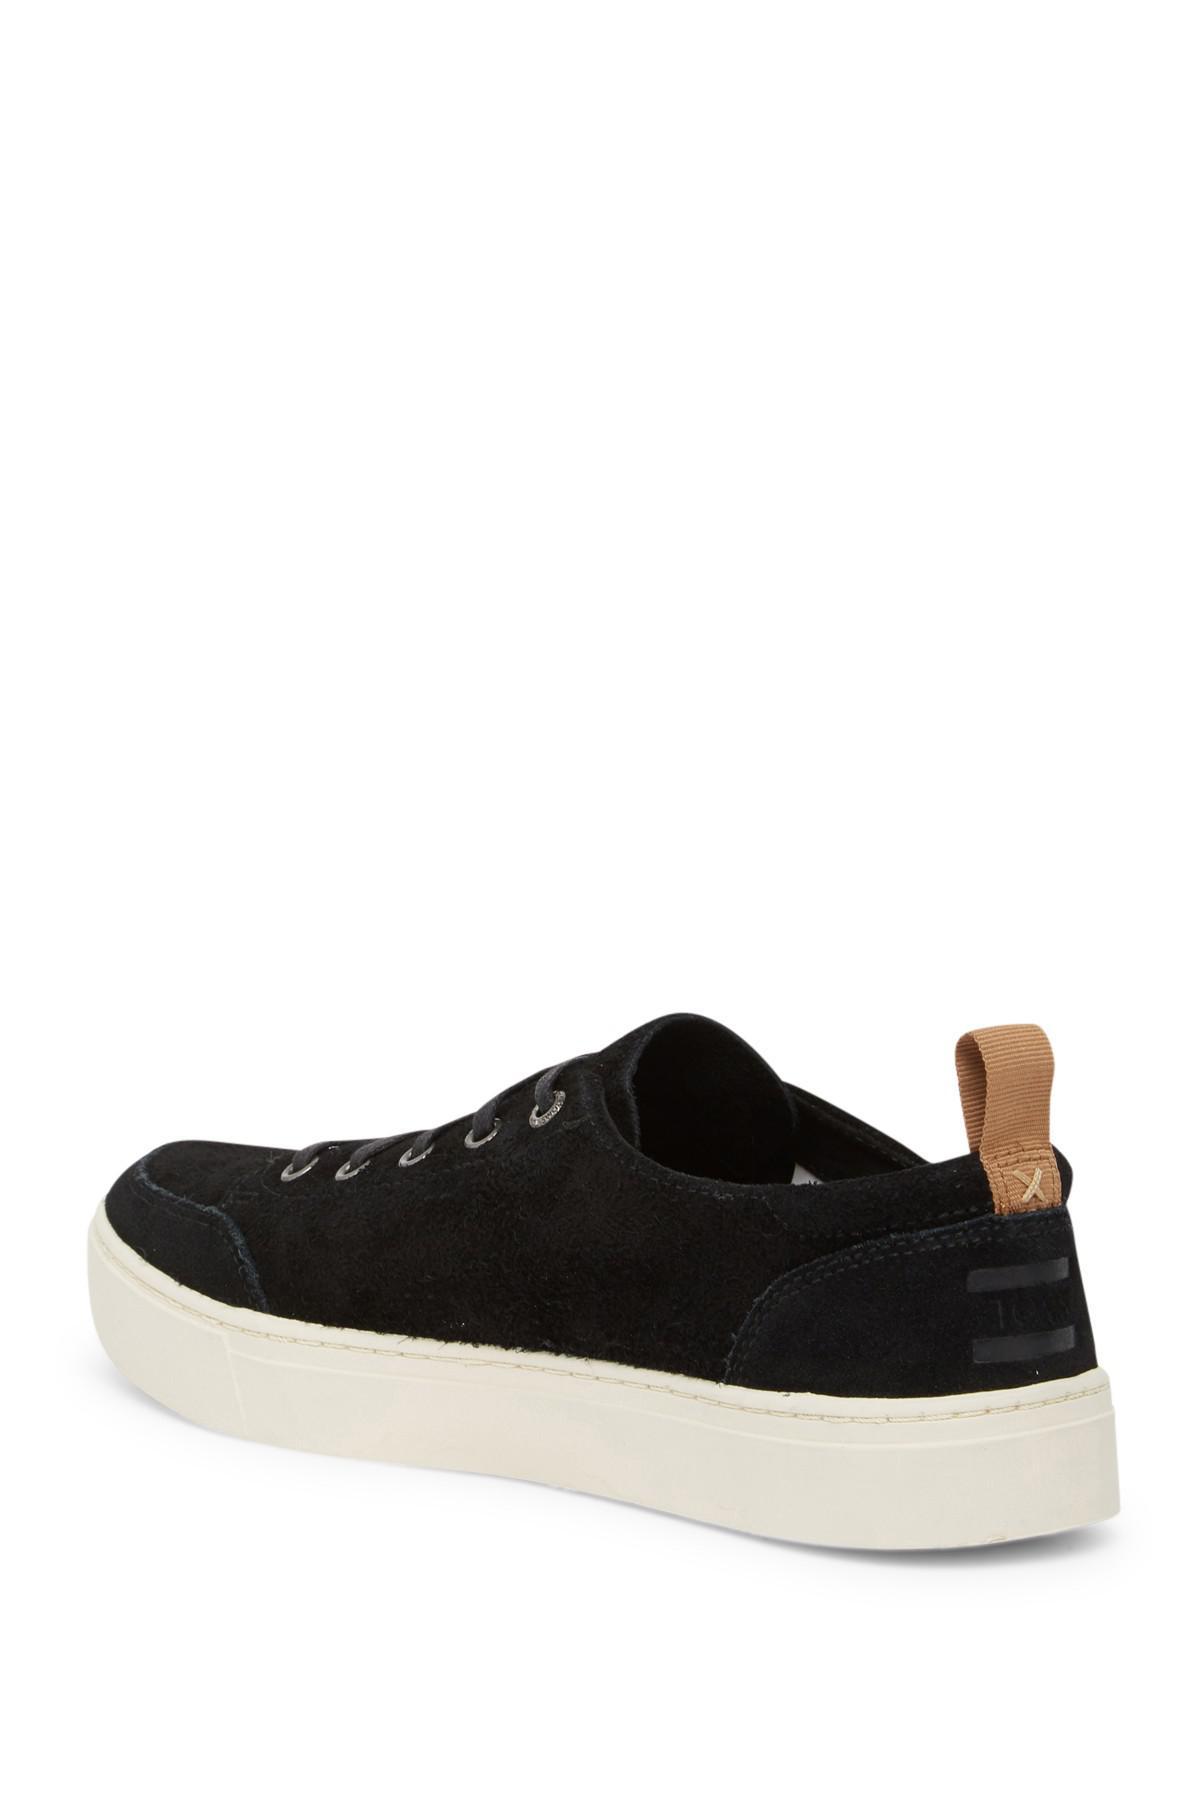 2bbb5bf4fe6 Lyst - TOMS Landen Shaggy Suede Sneaker in Black for Men